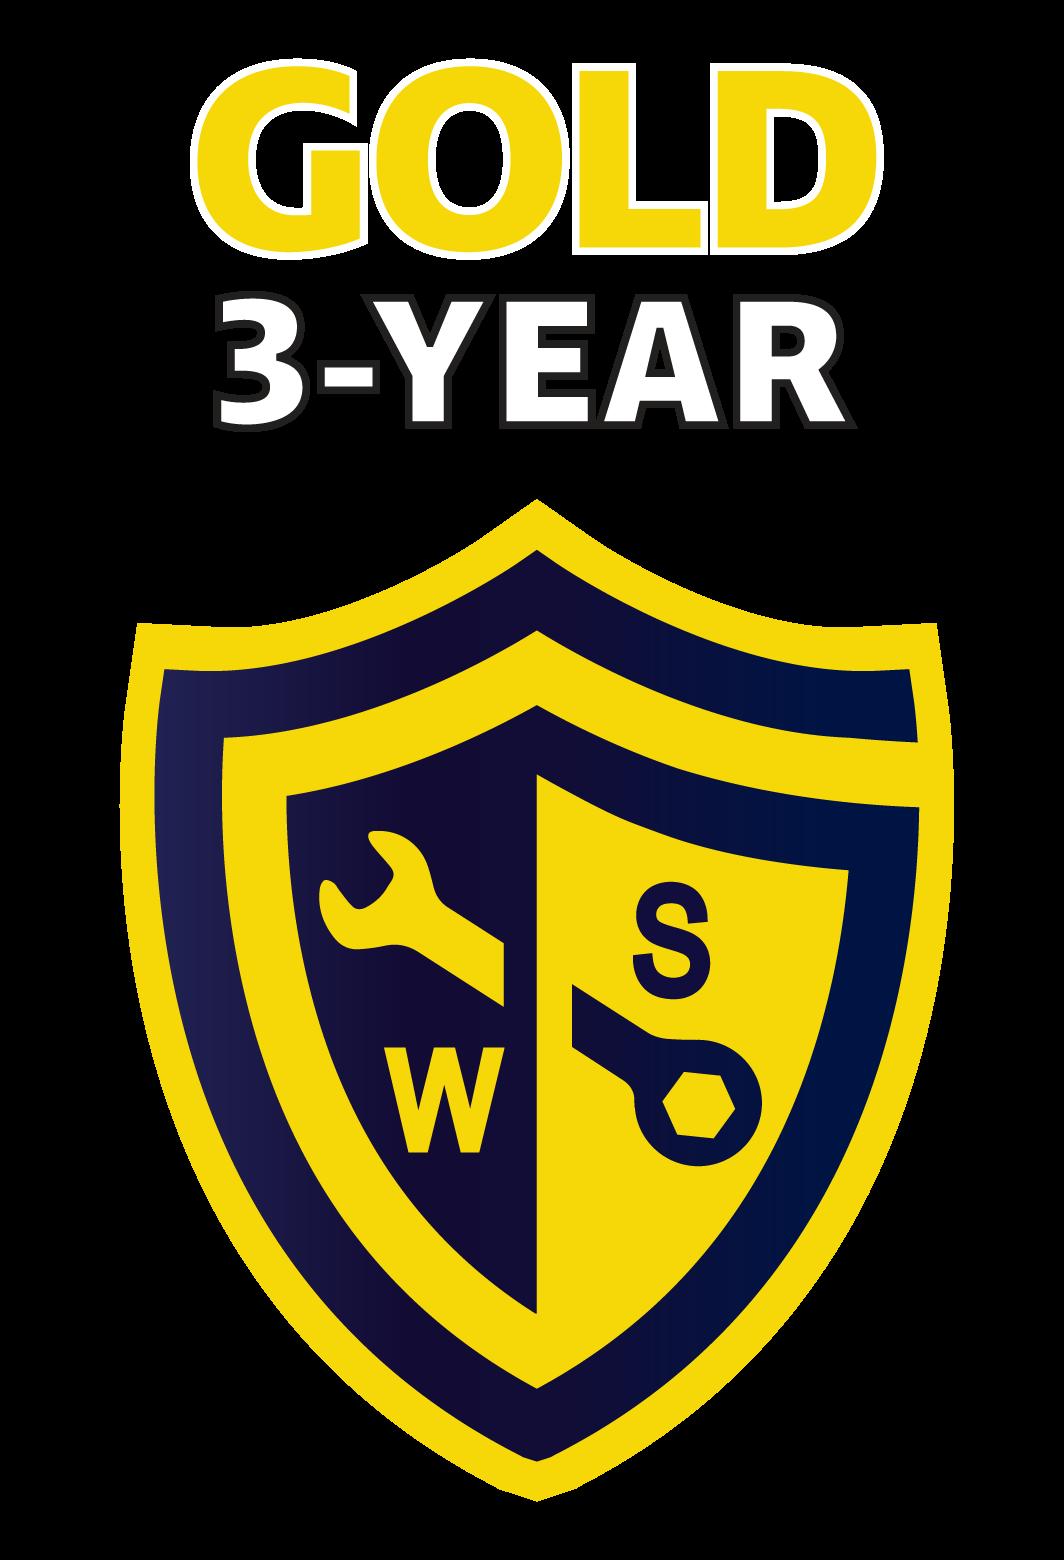 Gold - 3 Year